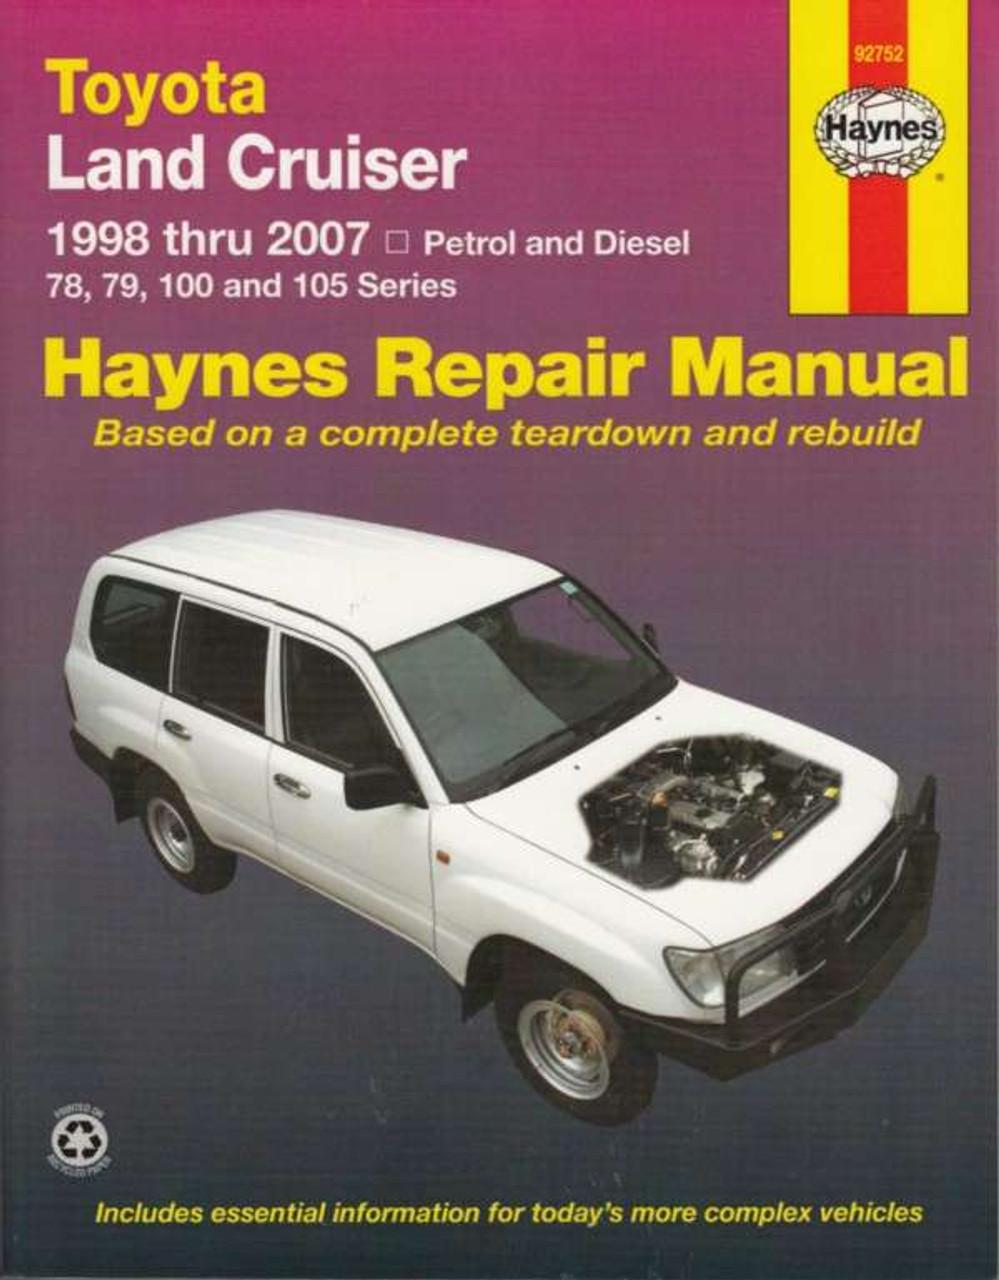 toyota land cruiser 78 79 100 105 petrol diesel 1998 2007 rh automotobookshop com au Toyota Land Cruiser FJ40 Old Toyota Land Cruiser